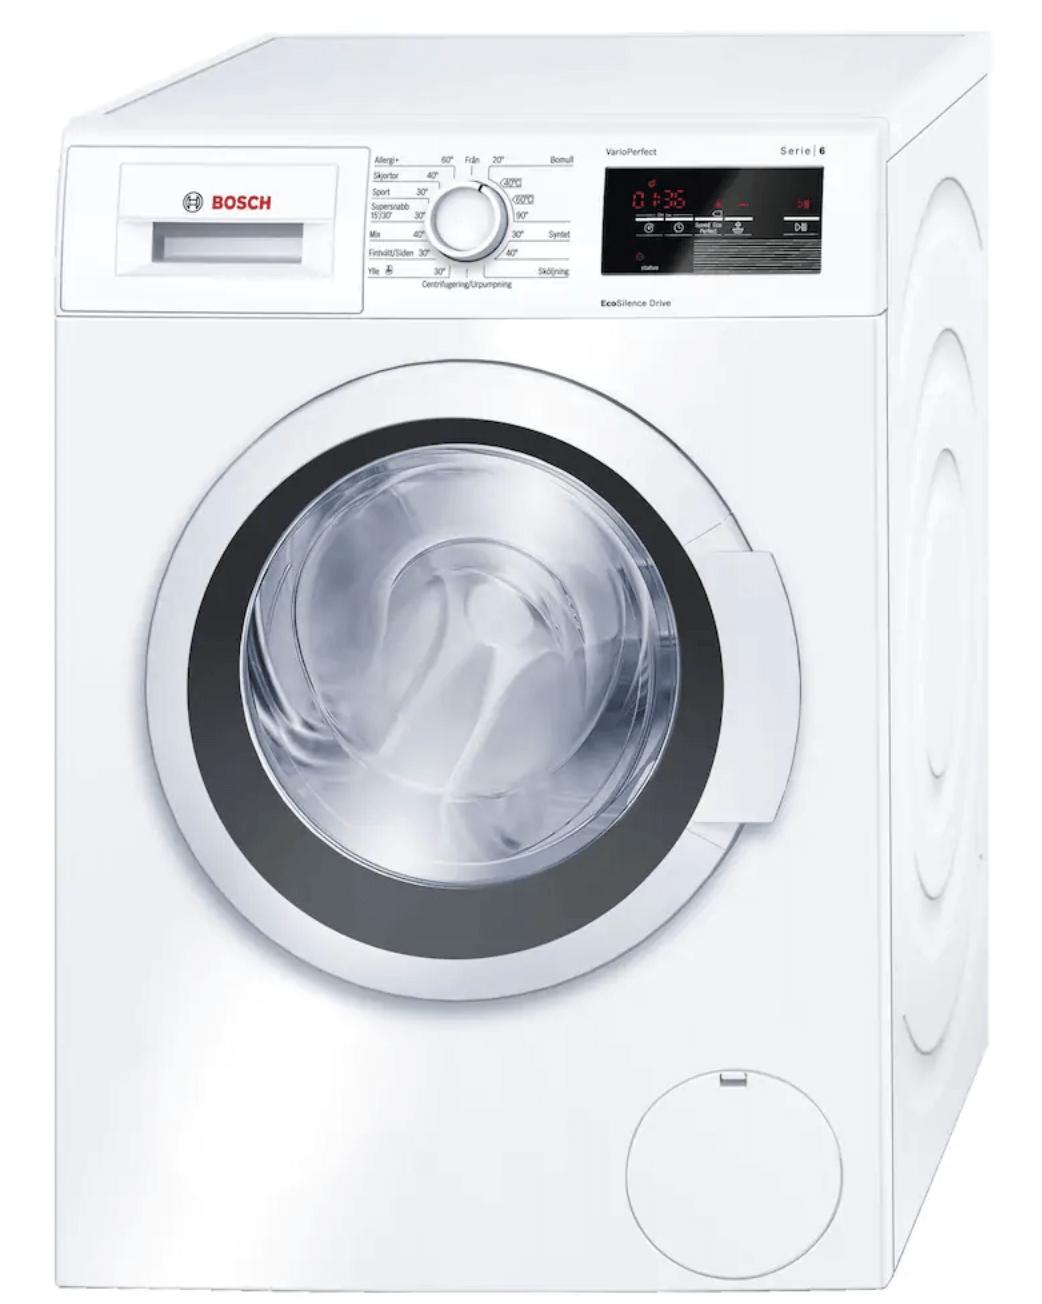 Bosch vaskemaskine - Bedste vaskemaskine - Bosch WAT283T8SN